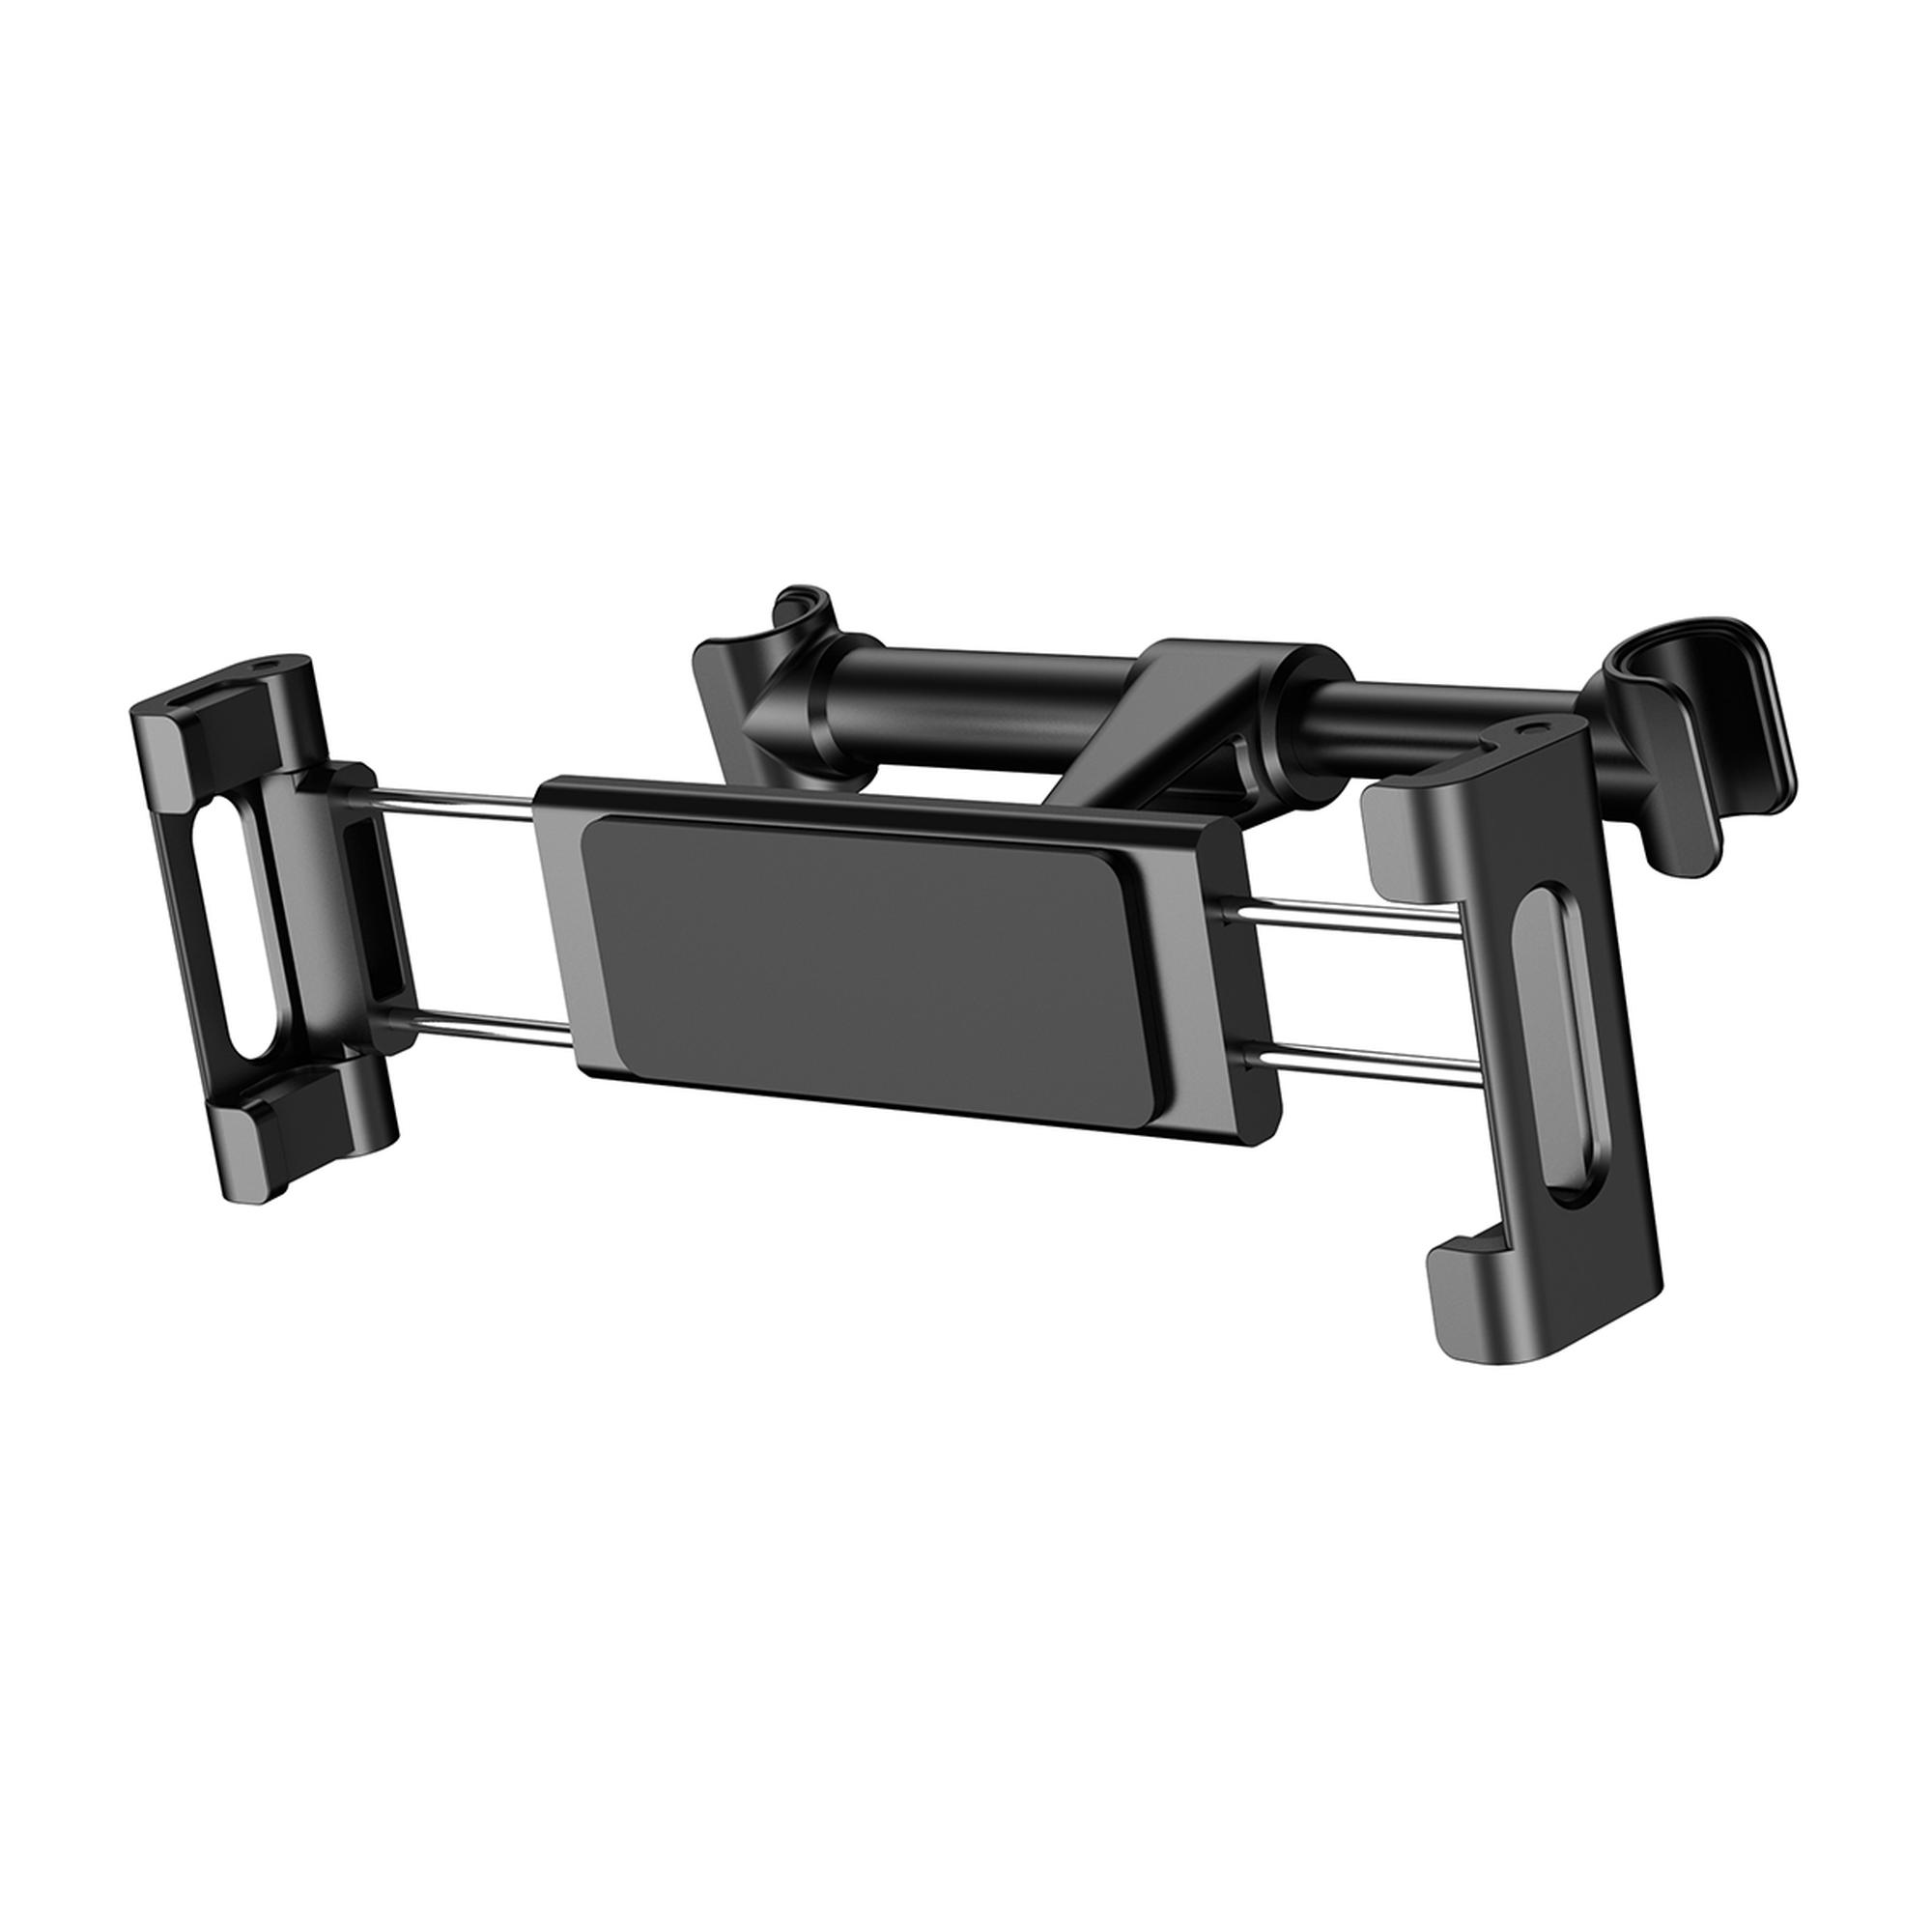 "Baseus Backseat Car Mount Universal Holder 4.7'' - 12.9"" Black"